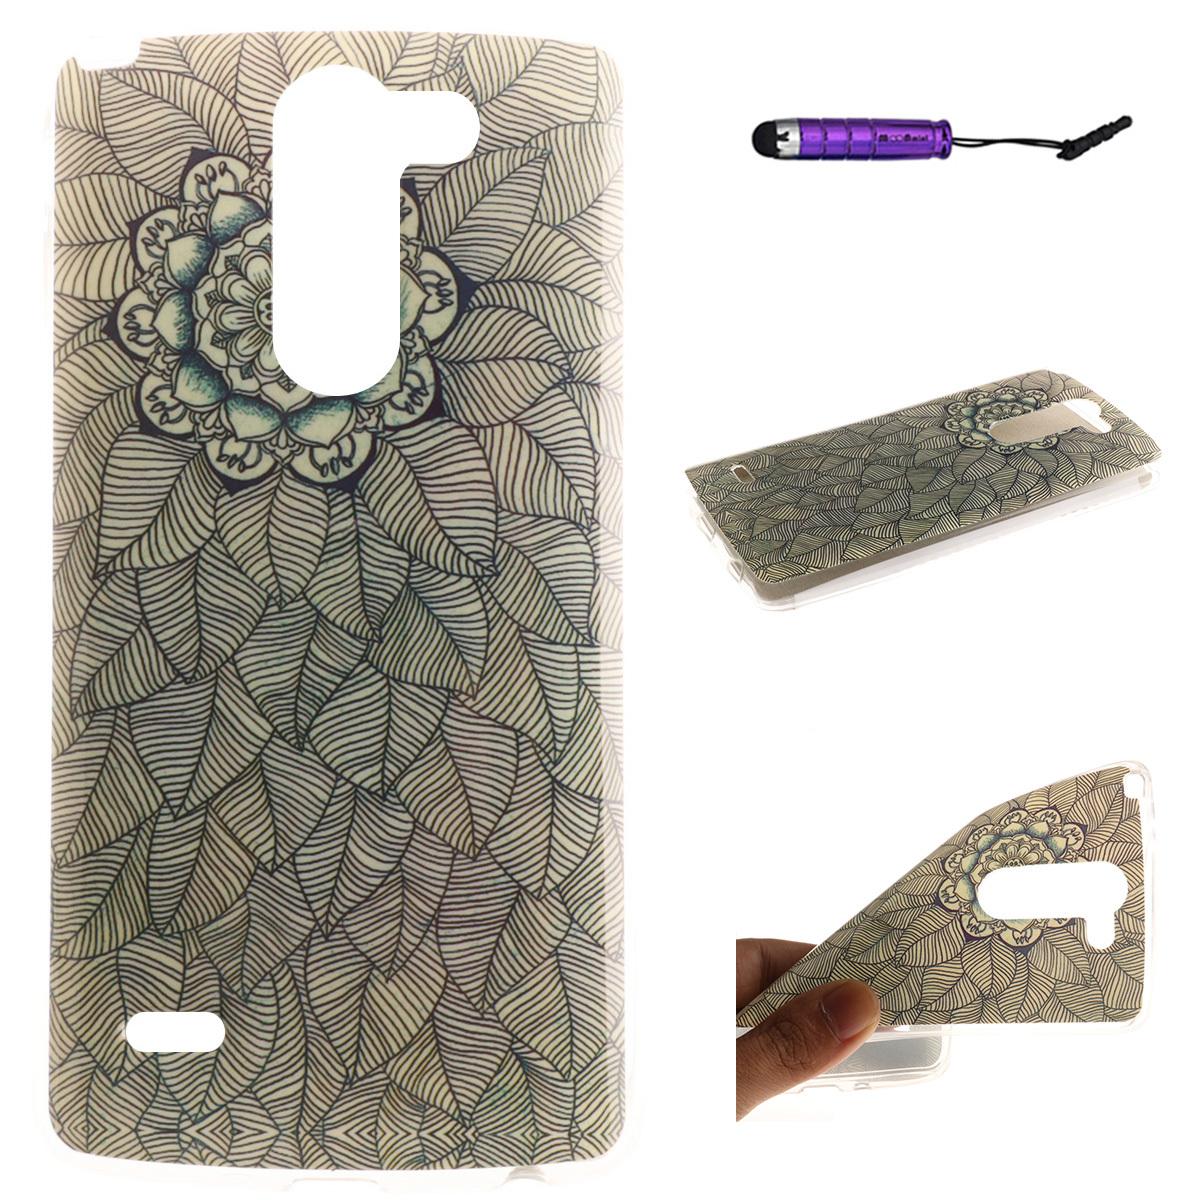 ... Moonmini Ultra Slim Fit Soft TPU Phone Back Protector Case Coverfor LG G3 Stylus D690 ...